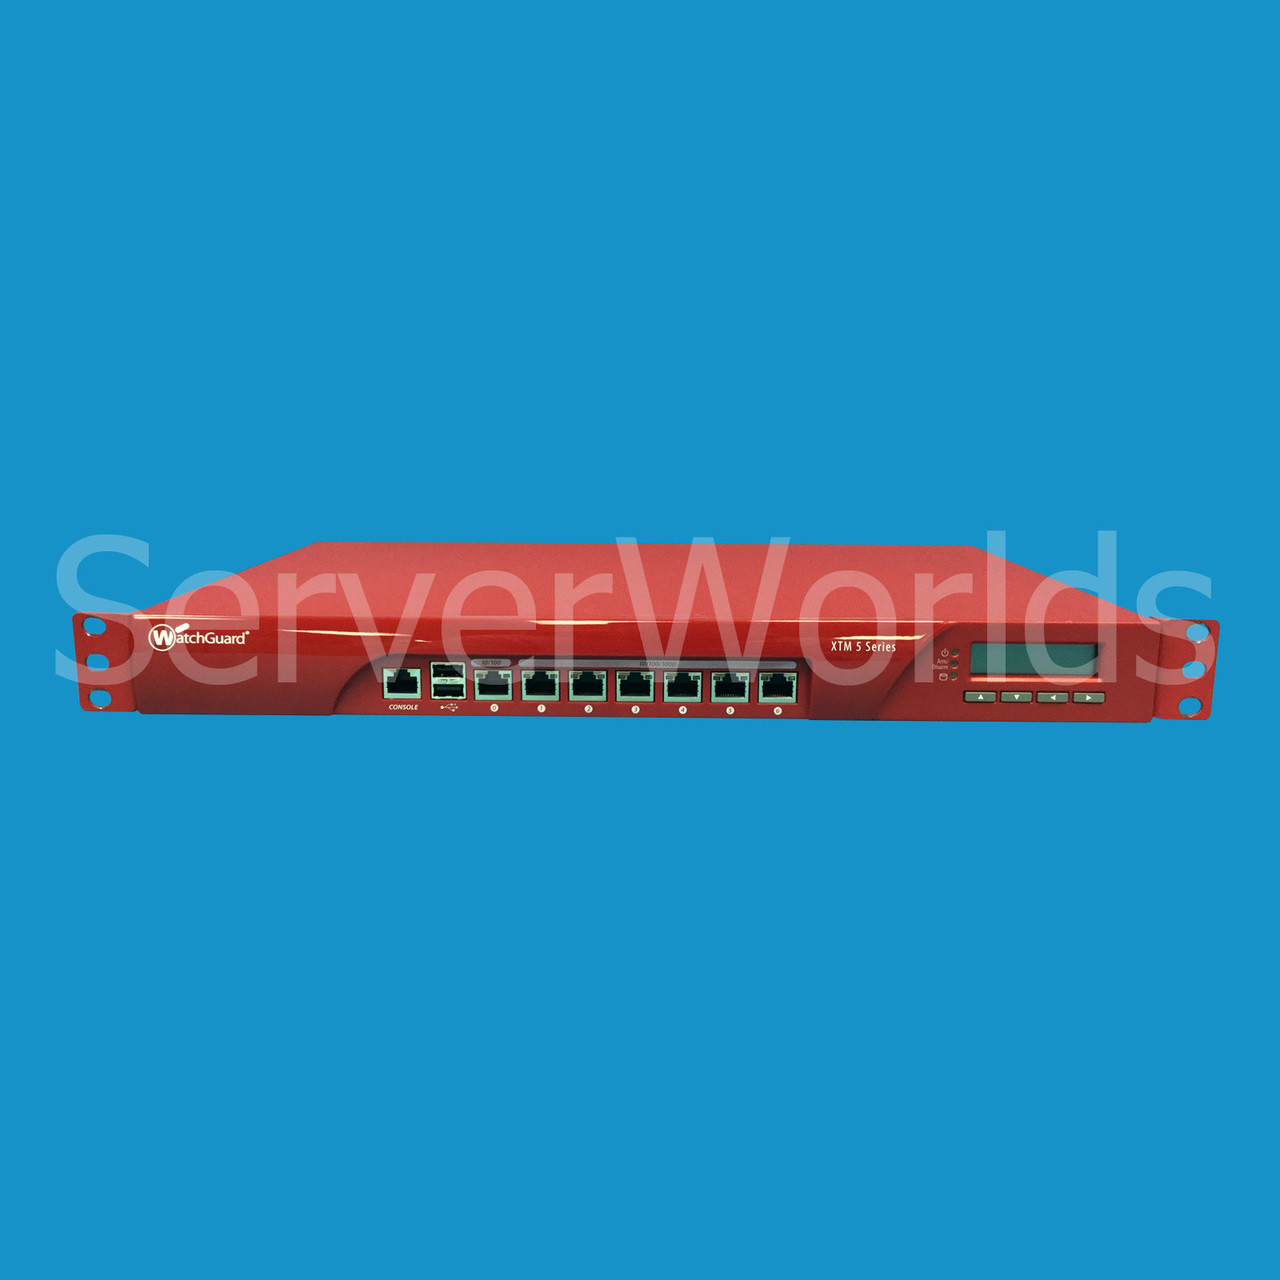 Watchguard NC2AE8 | XTM 5 Series 525 Network Firewall